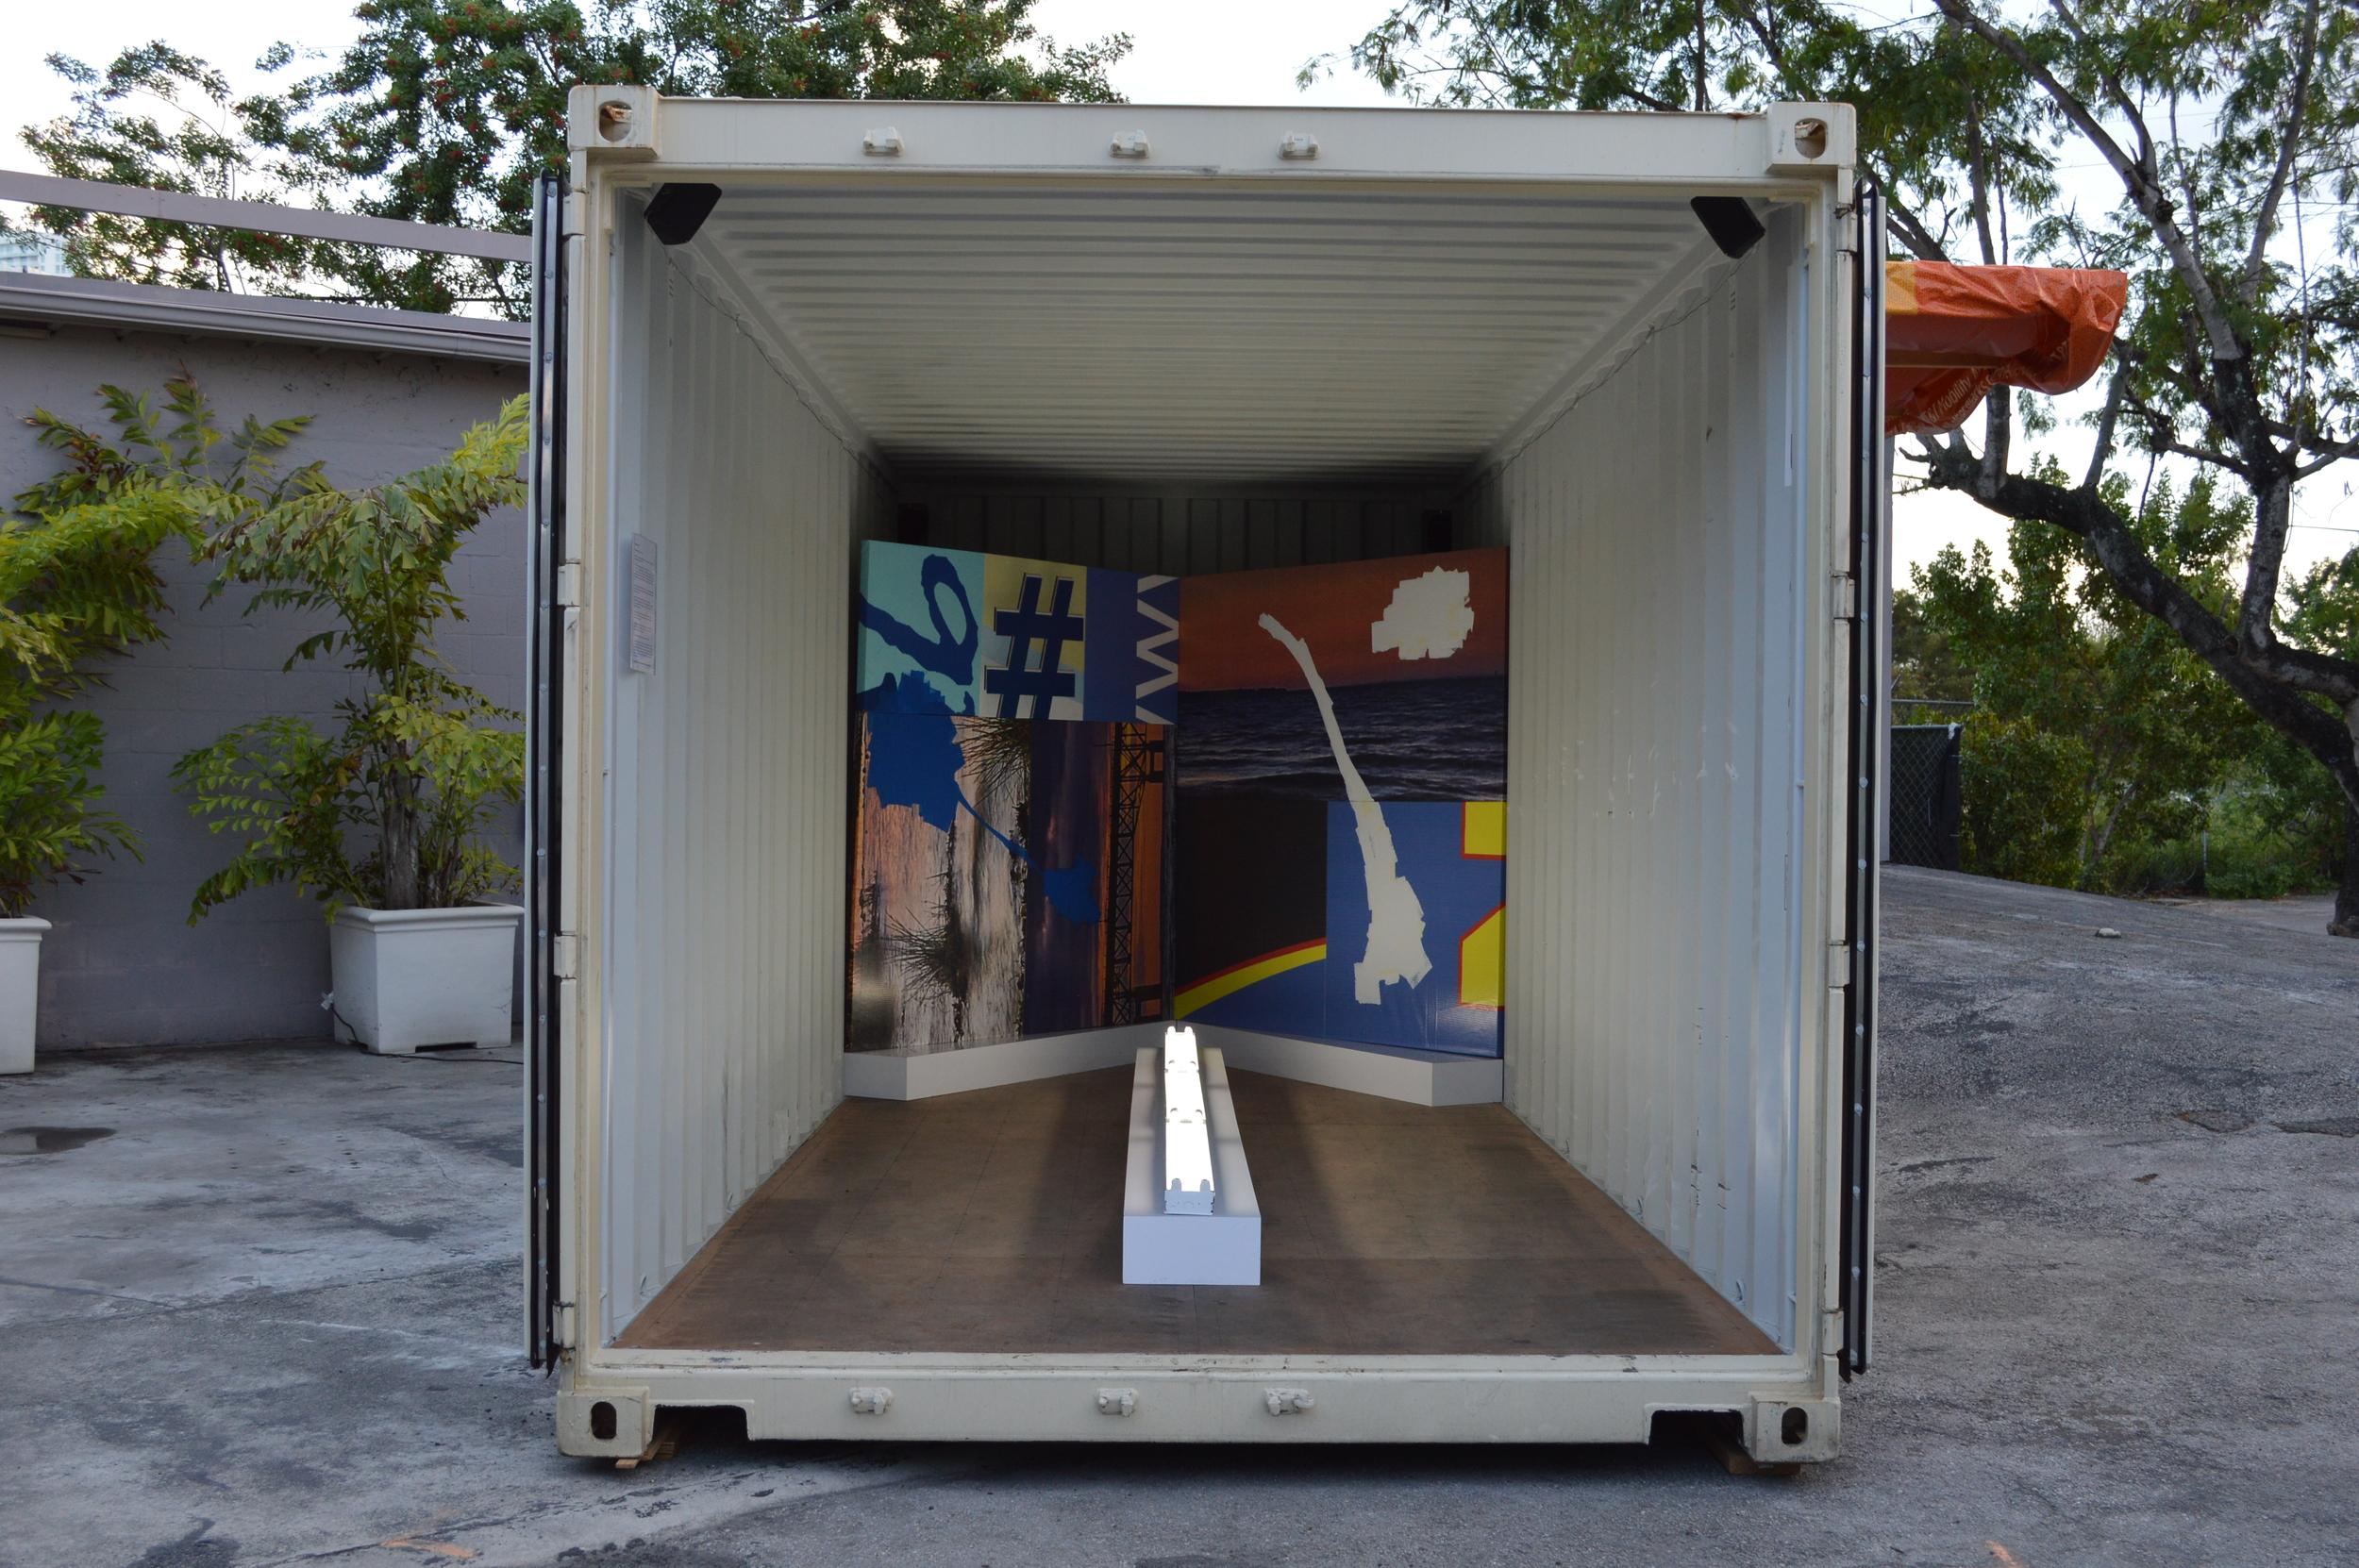 Michael Loveland's installation